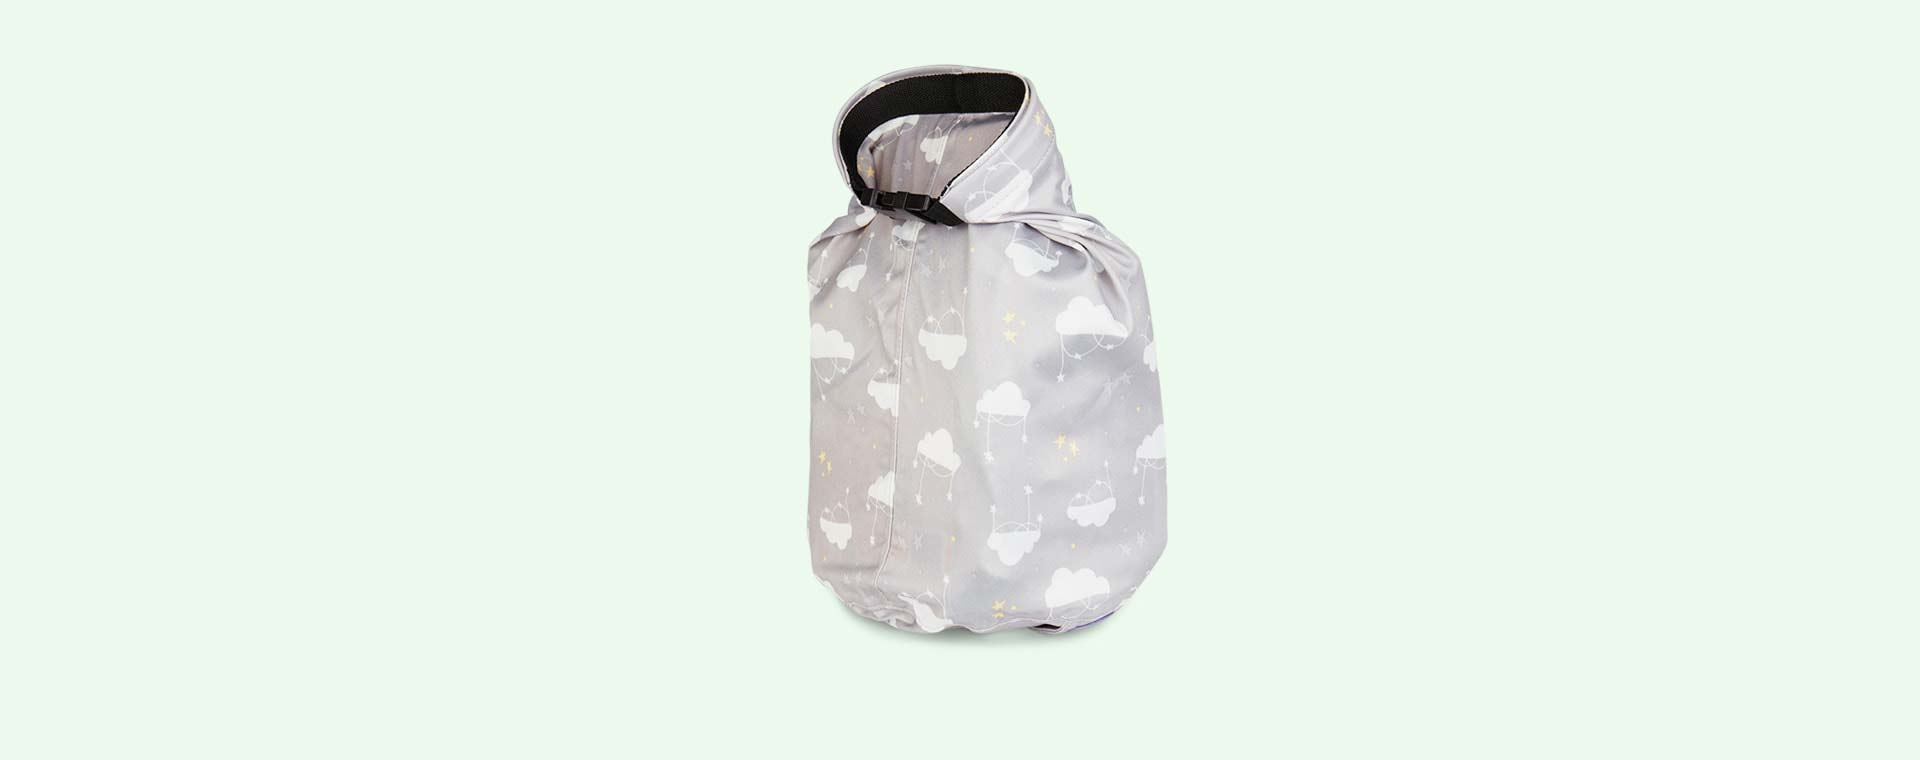 Cloud Nine Bambino Mio Wet Bag